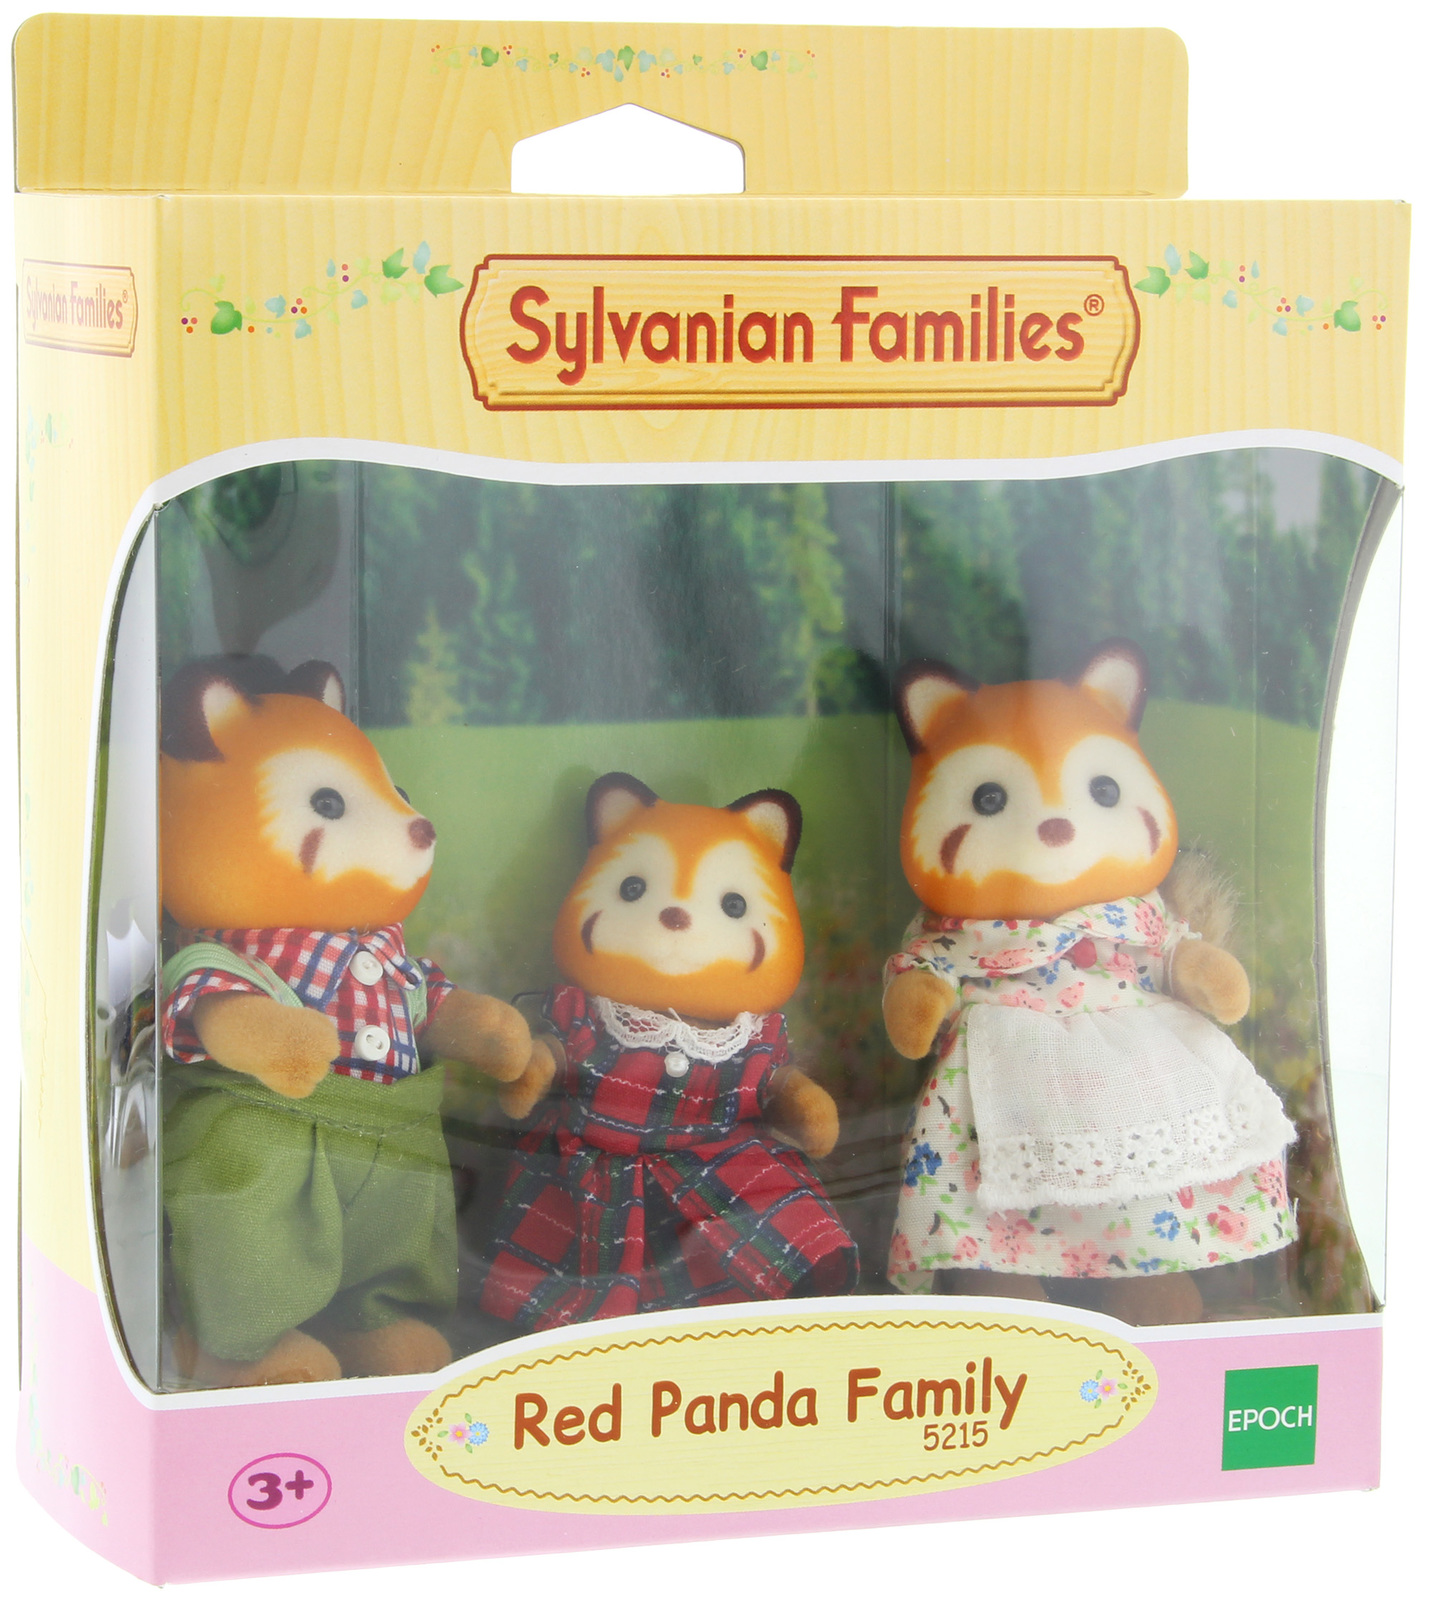 Sylvanian Families: Red Panda Family image